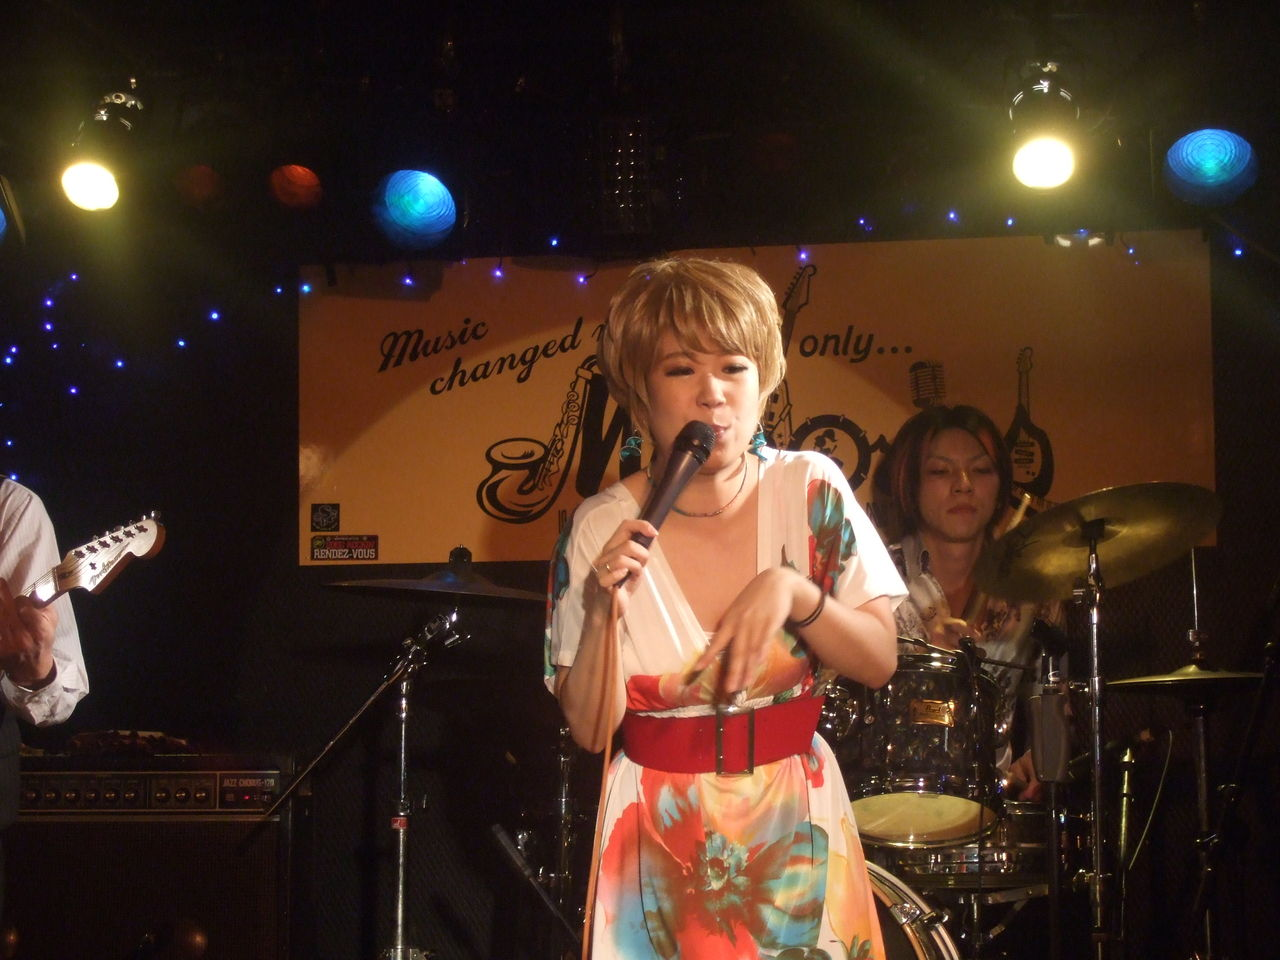 Rodoyoshiの 新宿メモリーズ buzz &momoちゃん